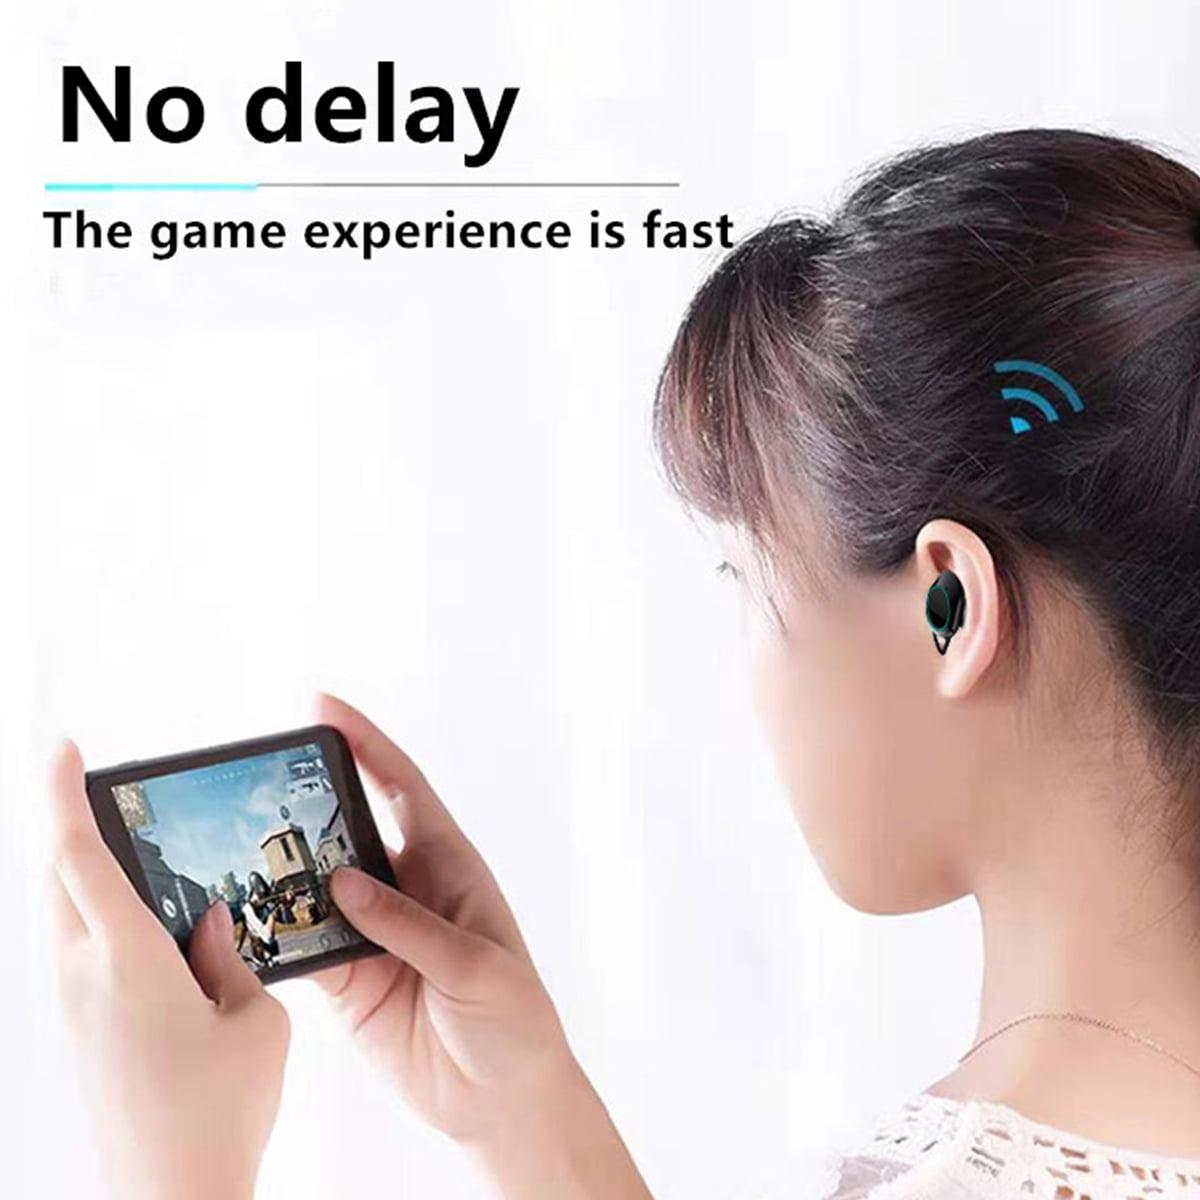 T2C TWS Bluetooth 5.0 earphone hifi stereo type-c charging case wholesale china 1 (2)